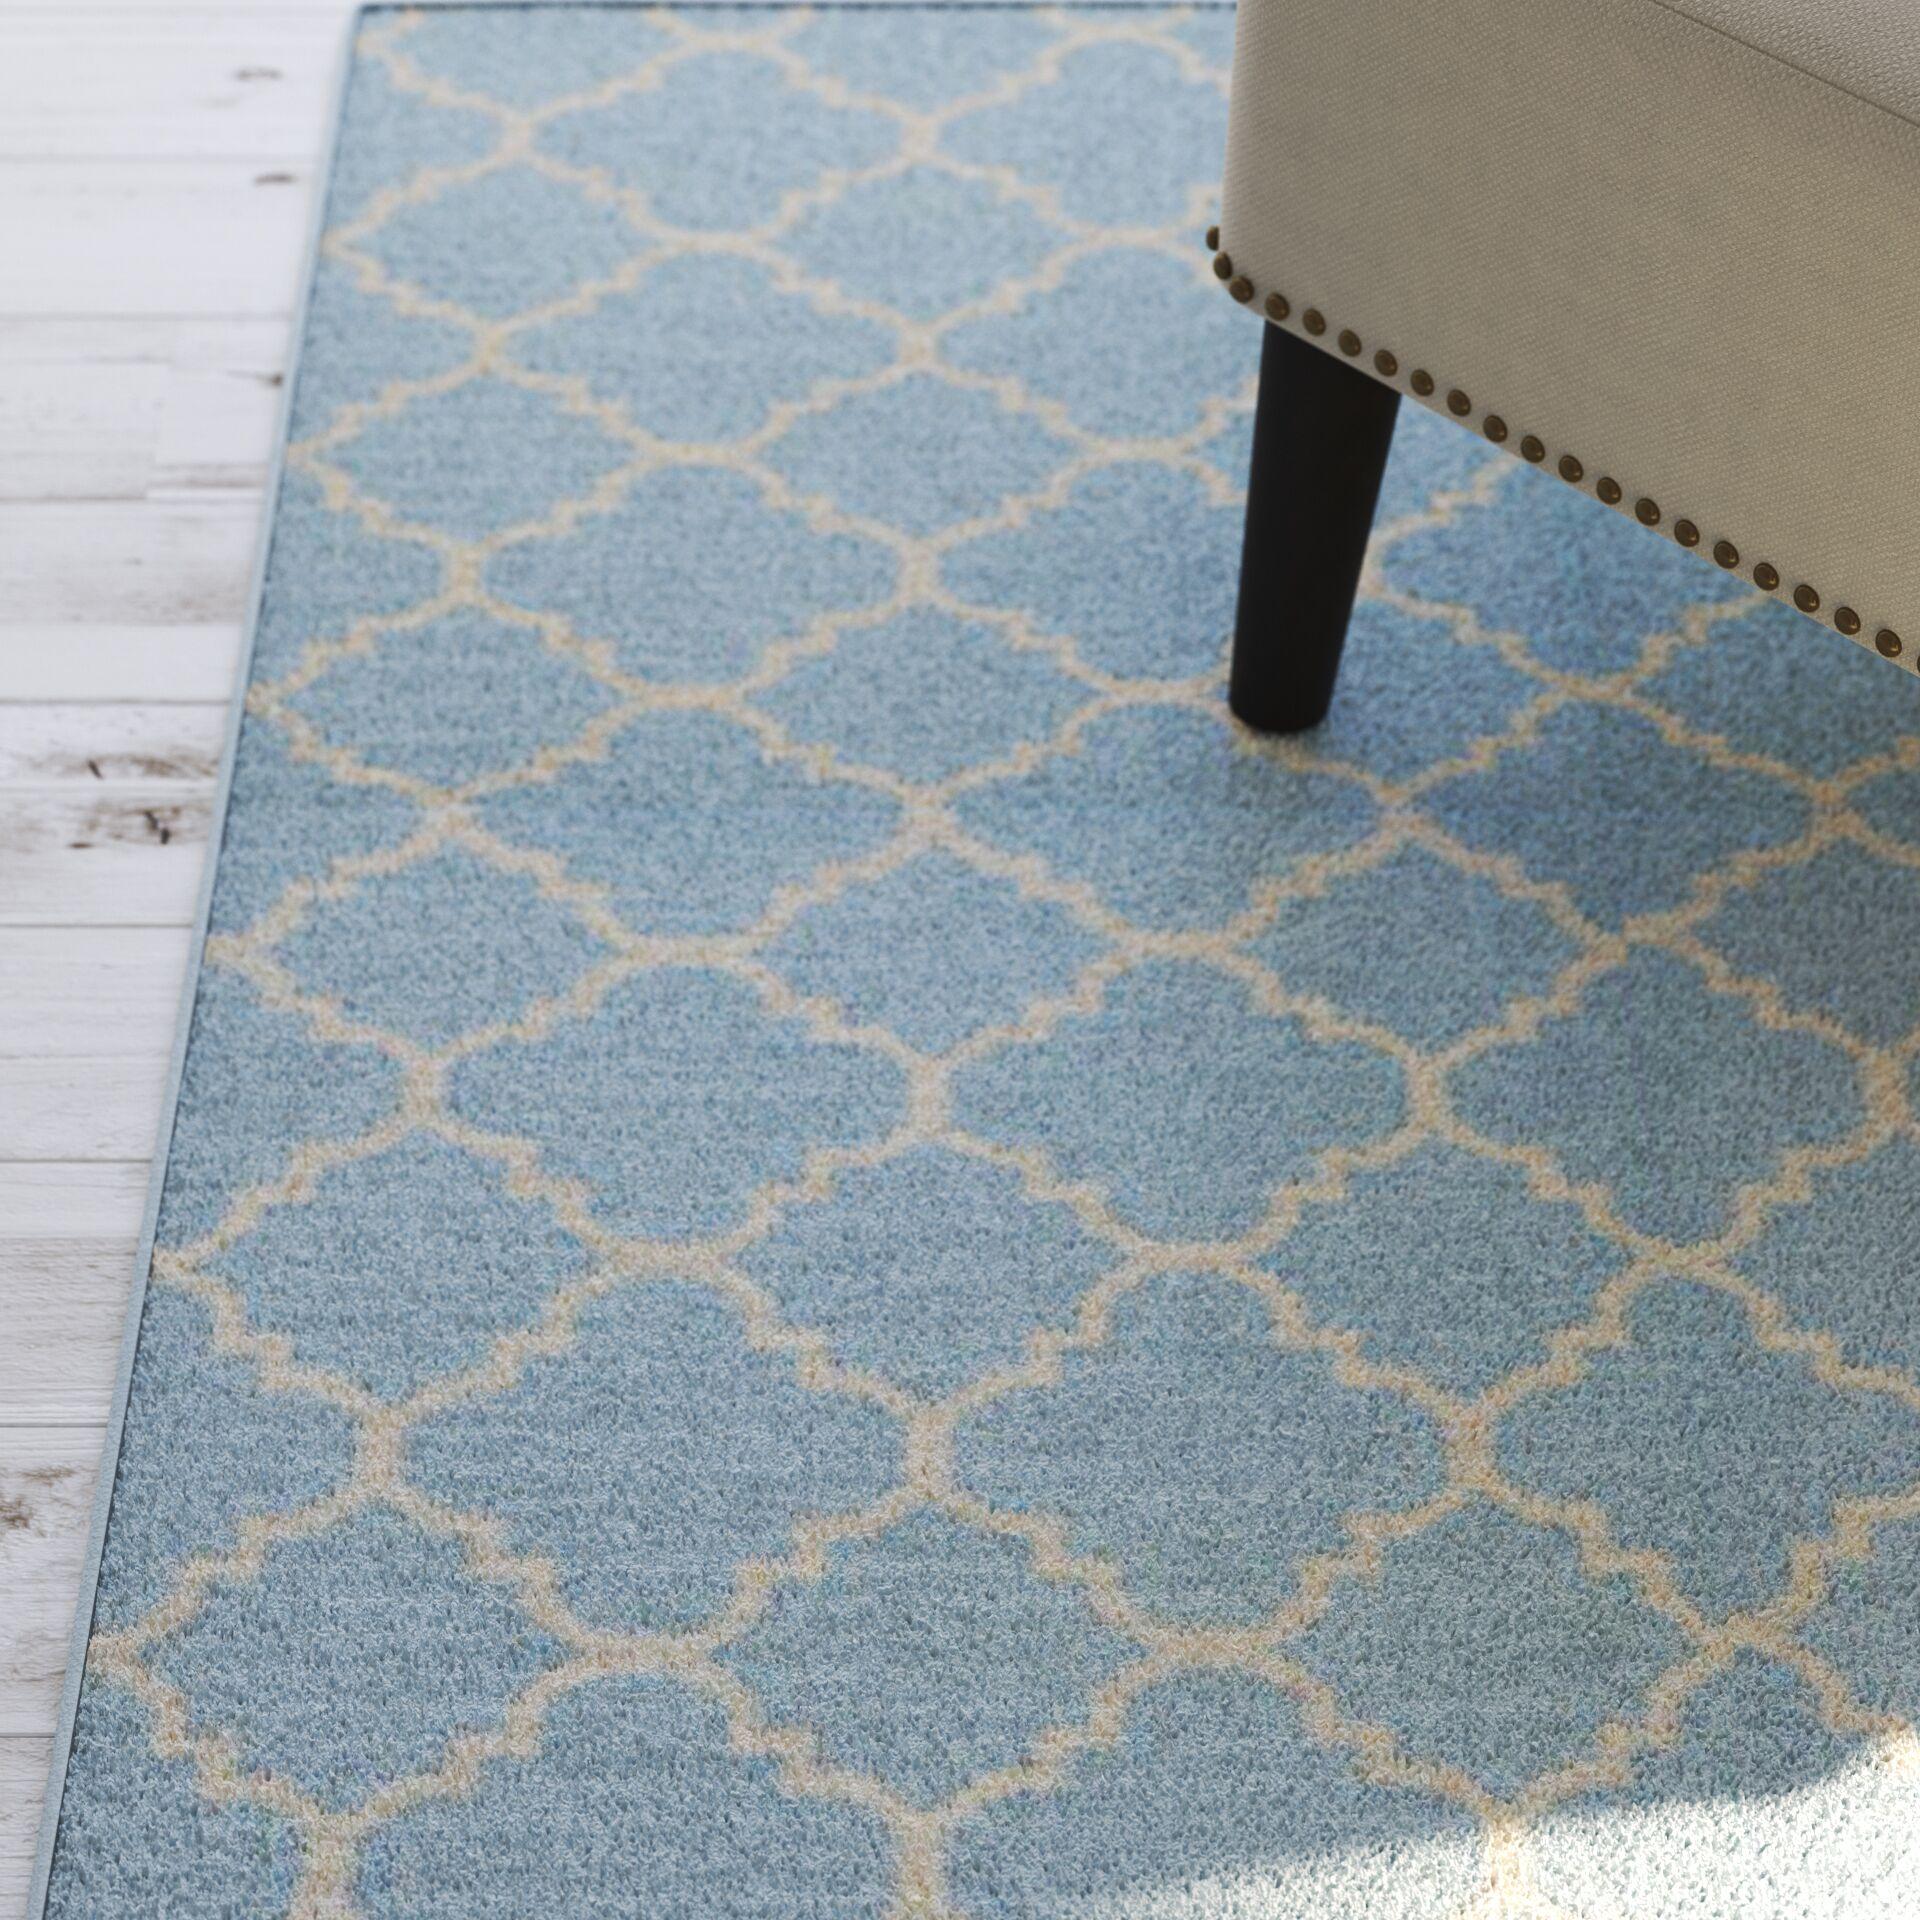 Danbury Hand-Woven Wool Light Blue/Ivory Area Rug Rug Size: Rectangle 4' x 6'